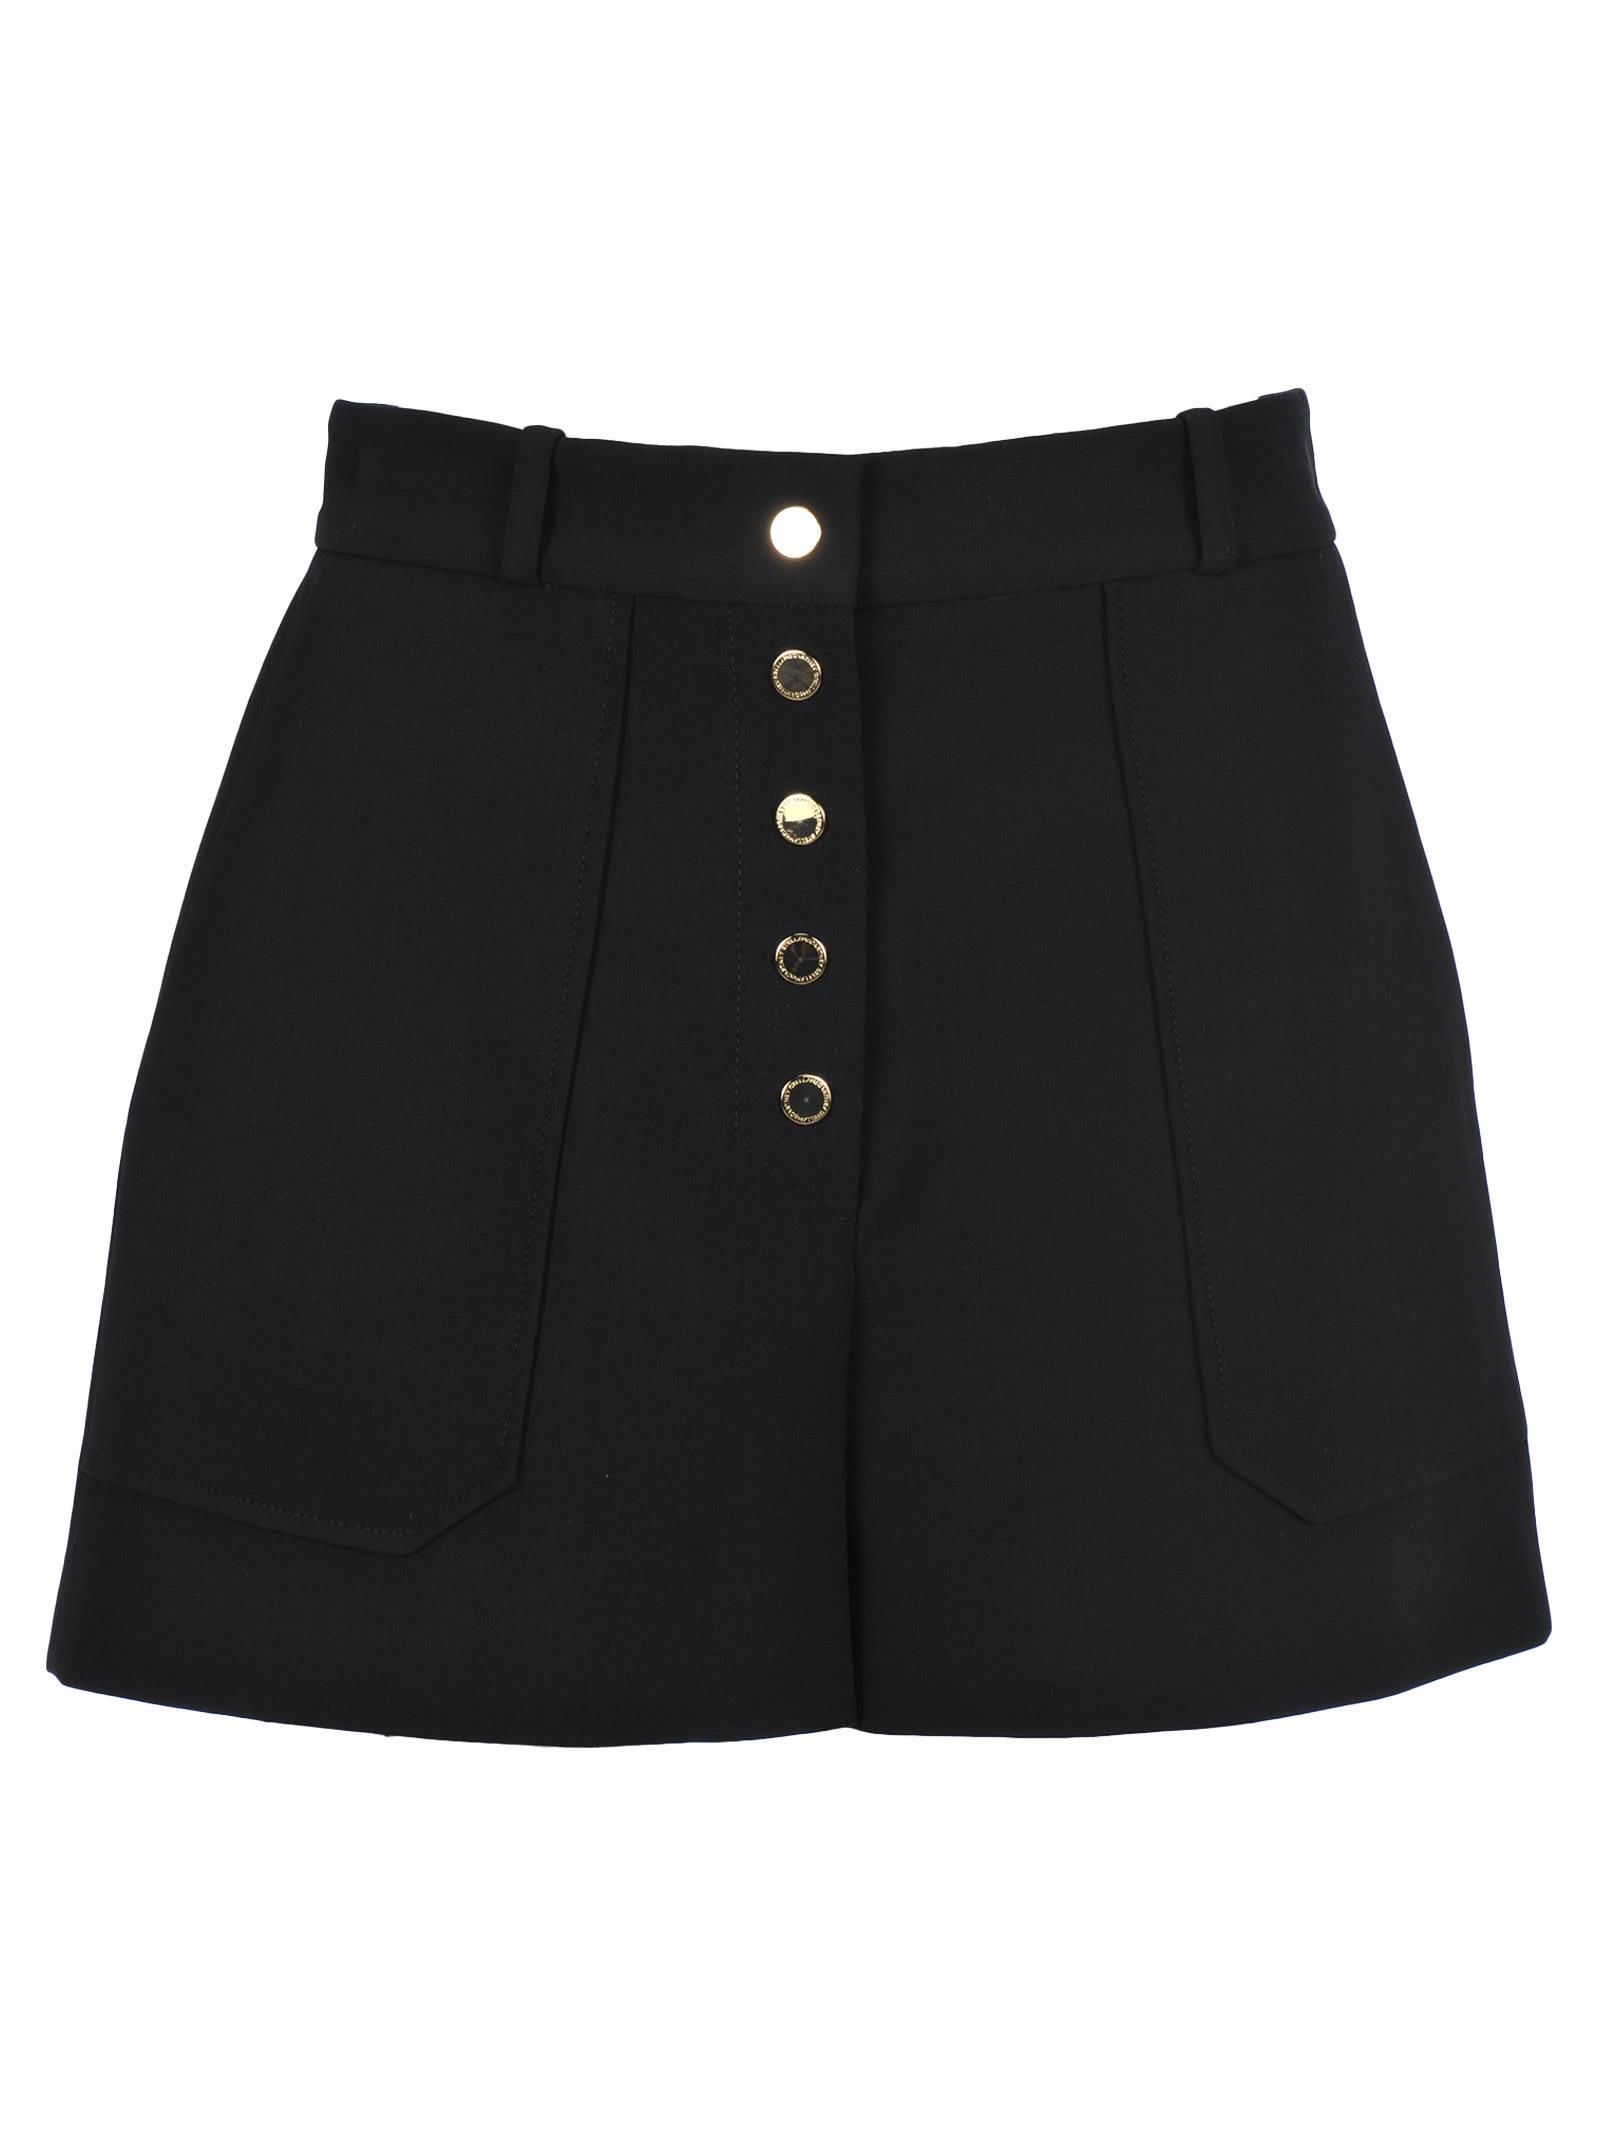 Stella McCartney Stella Mccartney Gold Button Shorts